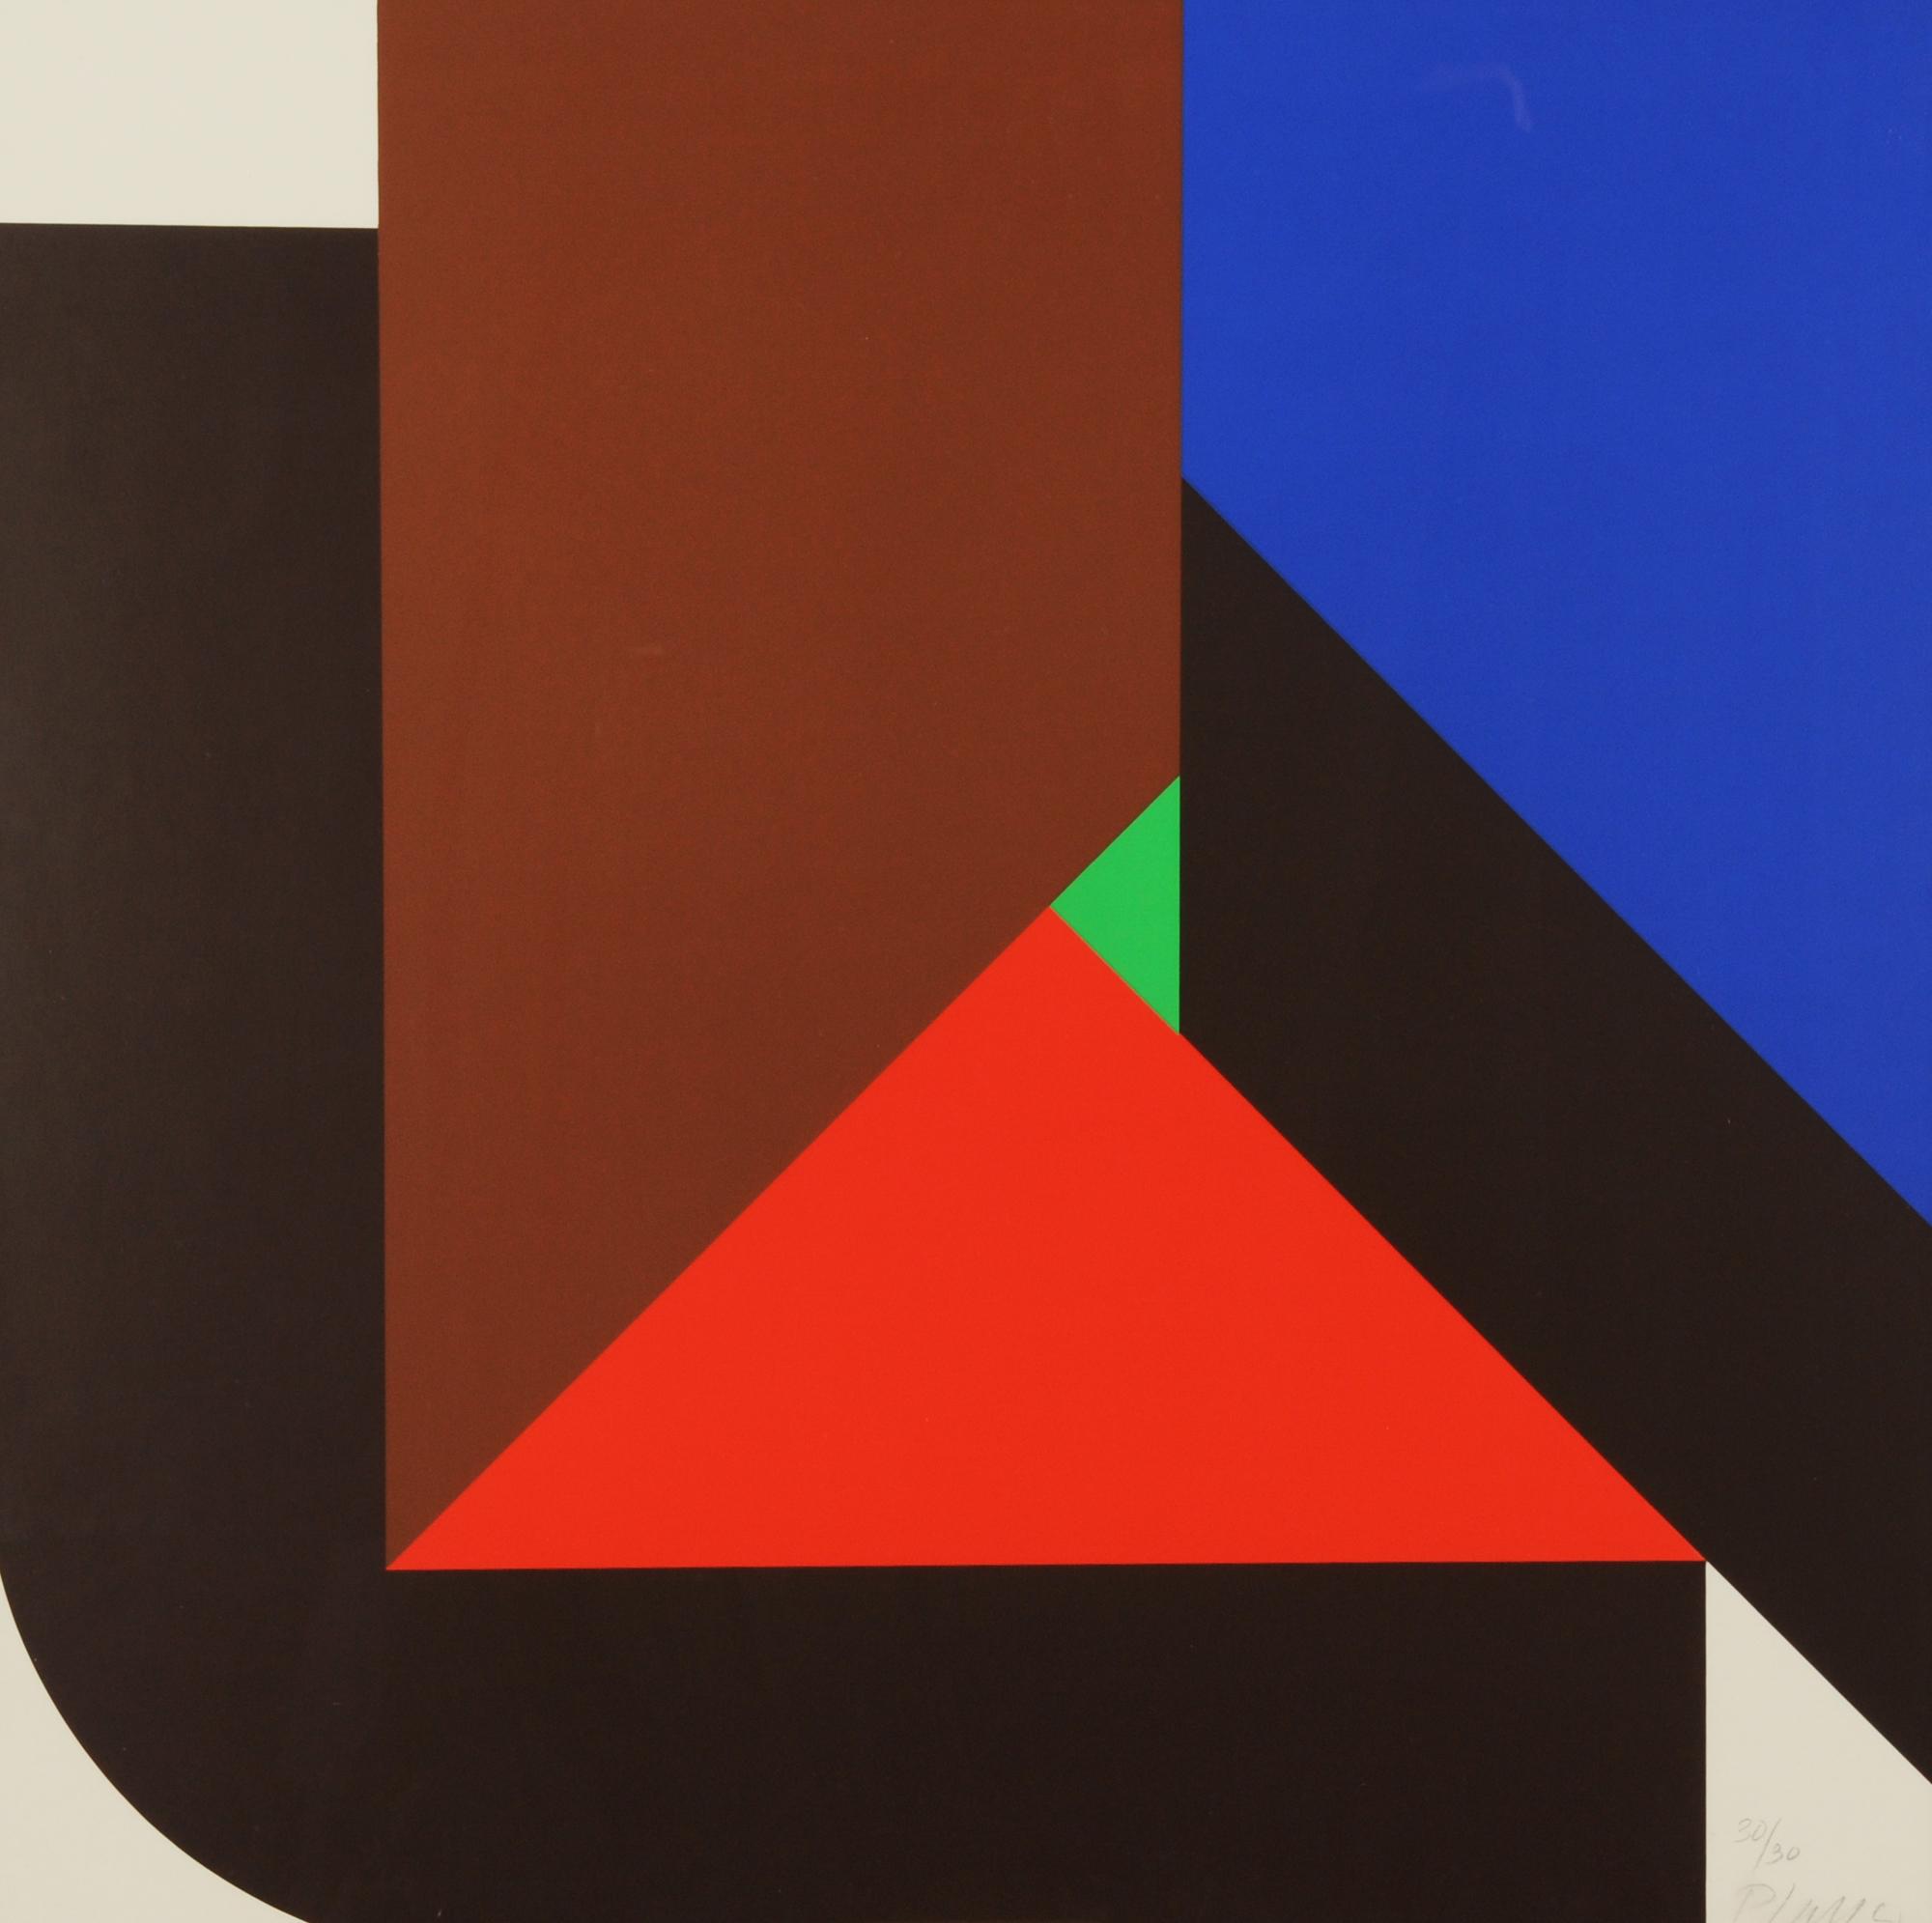 Pfahler Georg Karl, 3 sheets: Untitled